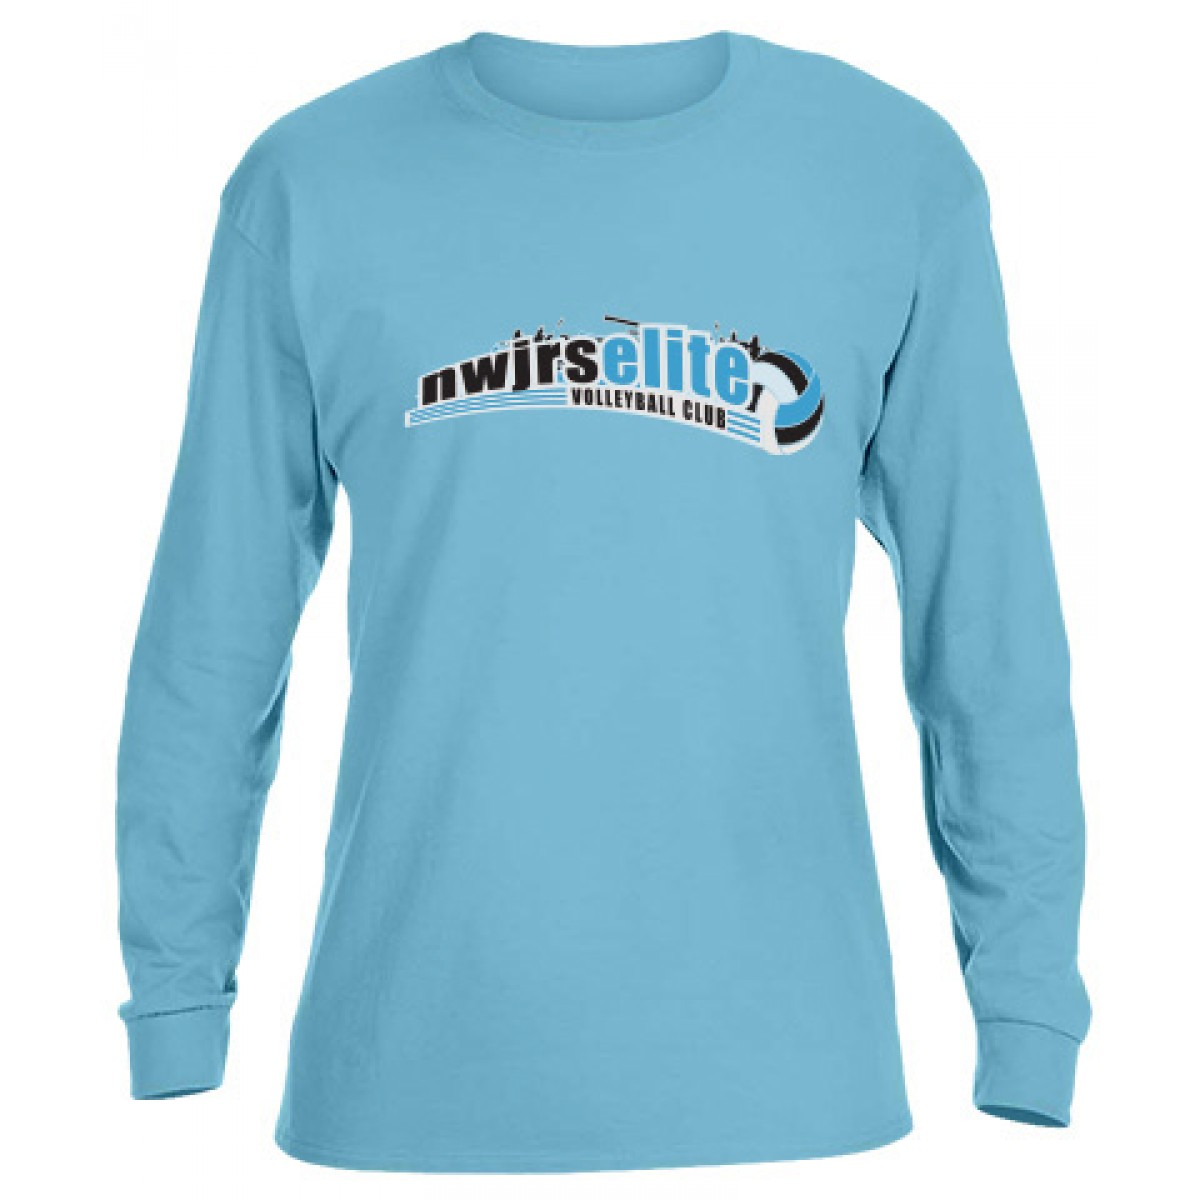 Northwest Volleyball Foundation Scholarship Program-Sky Blue-2XL